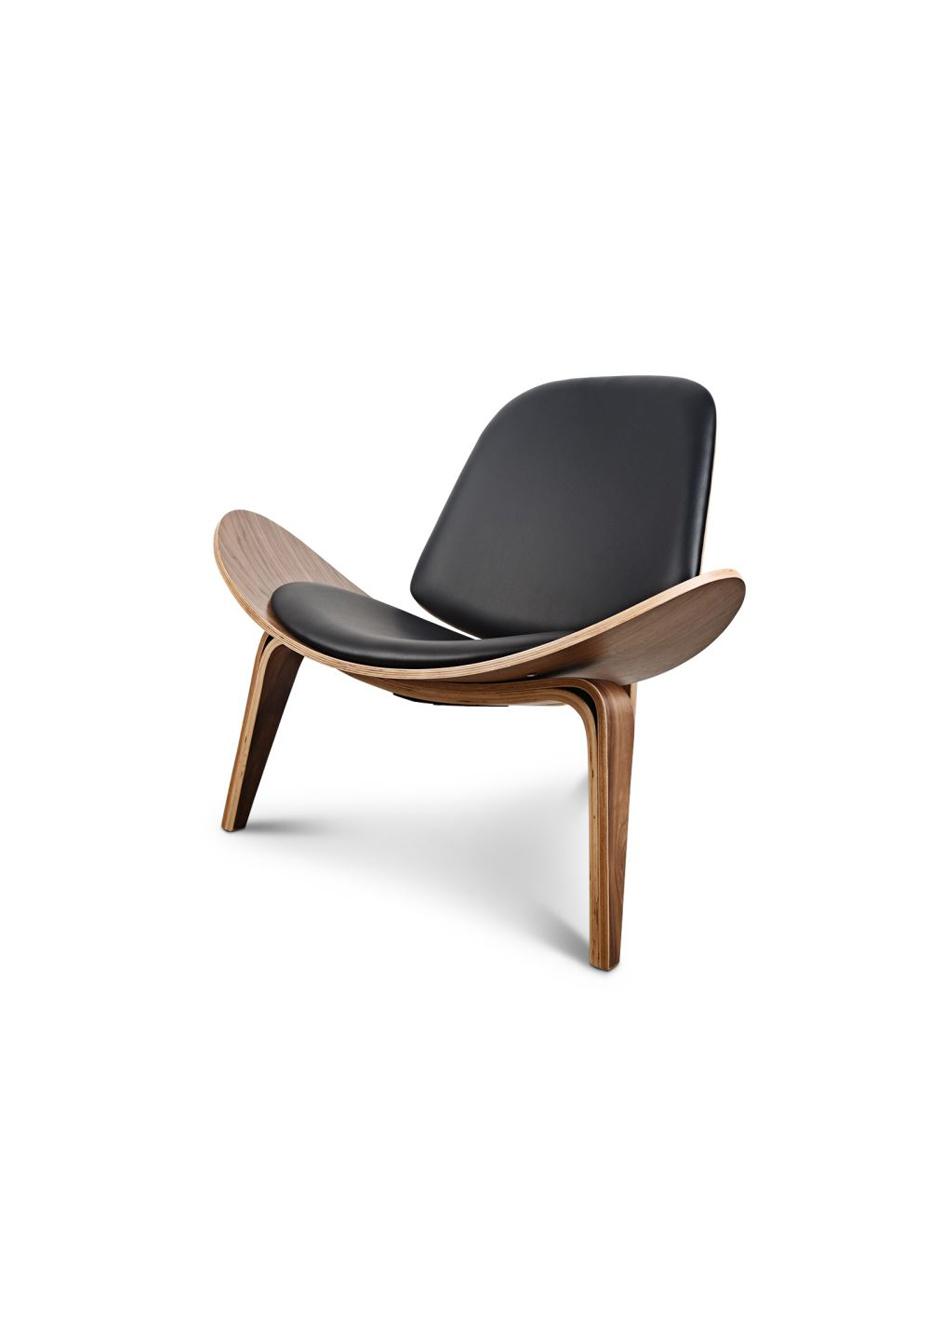 shell chair replica gaming recliner designer occasional black scandi